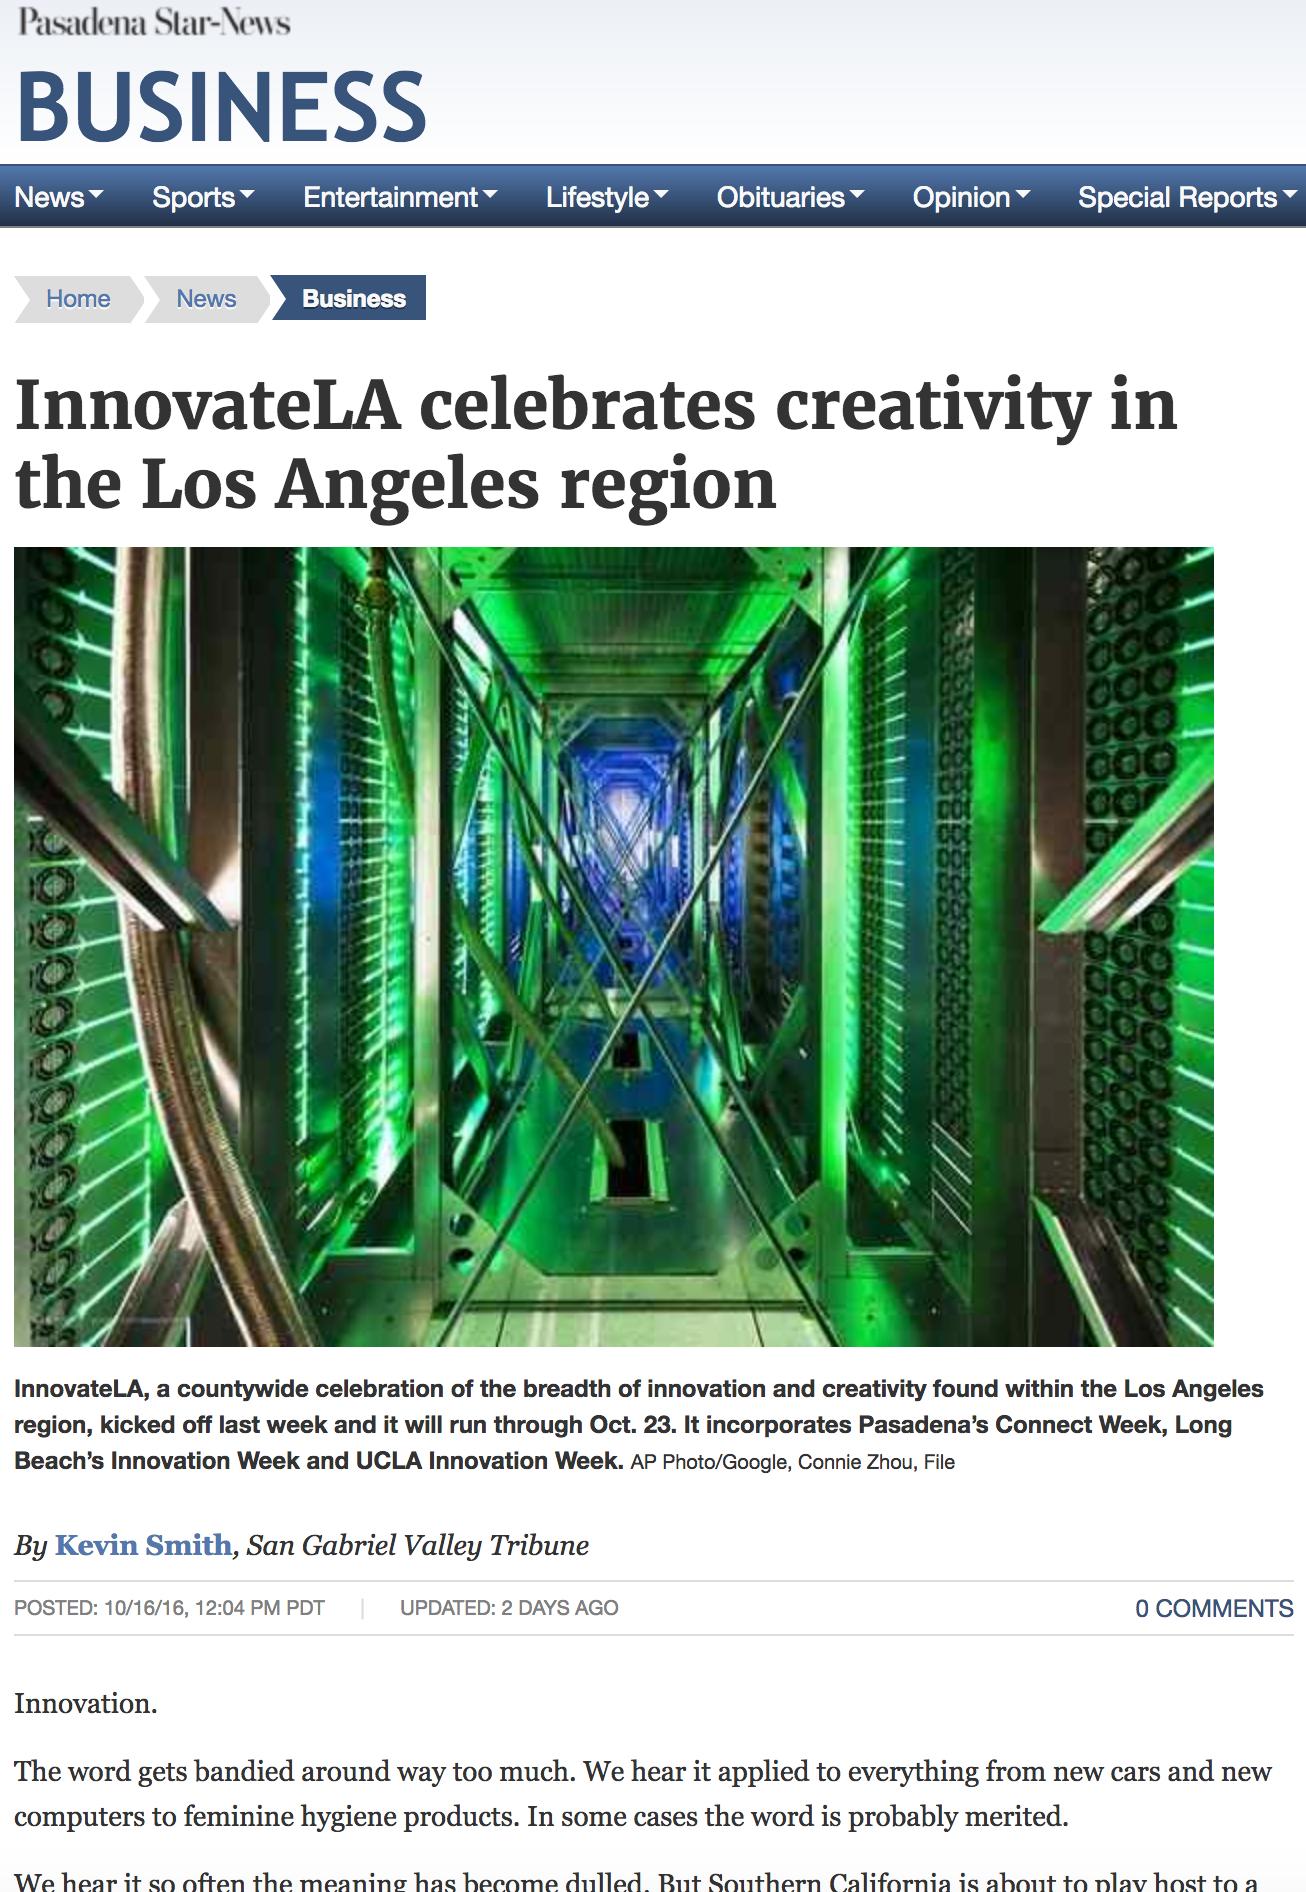 Pasadena Star News: InnovateLA Celebrates Creativity in the LA Region